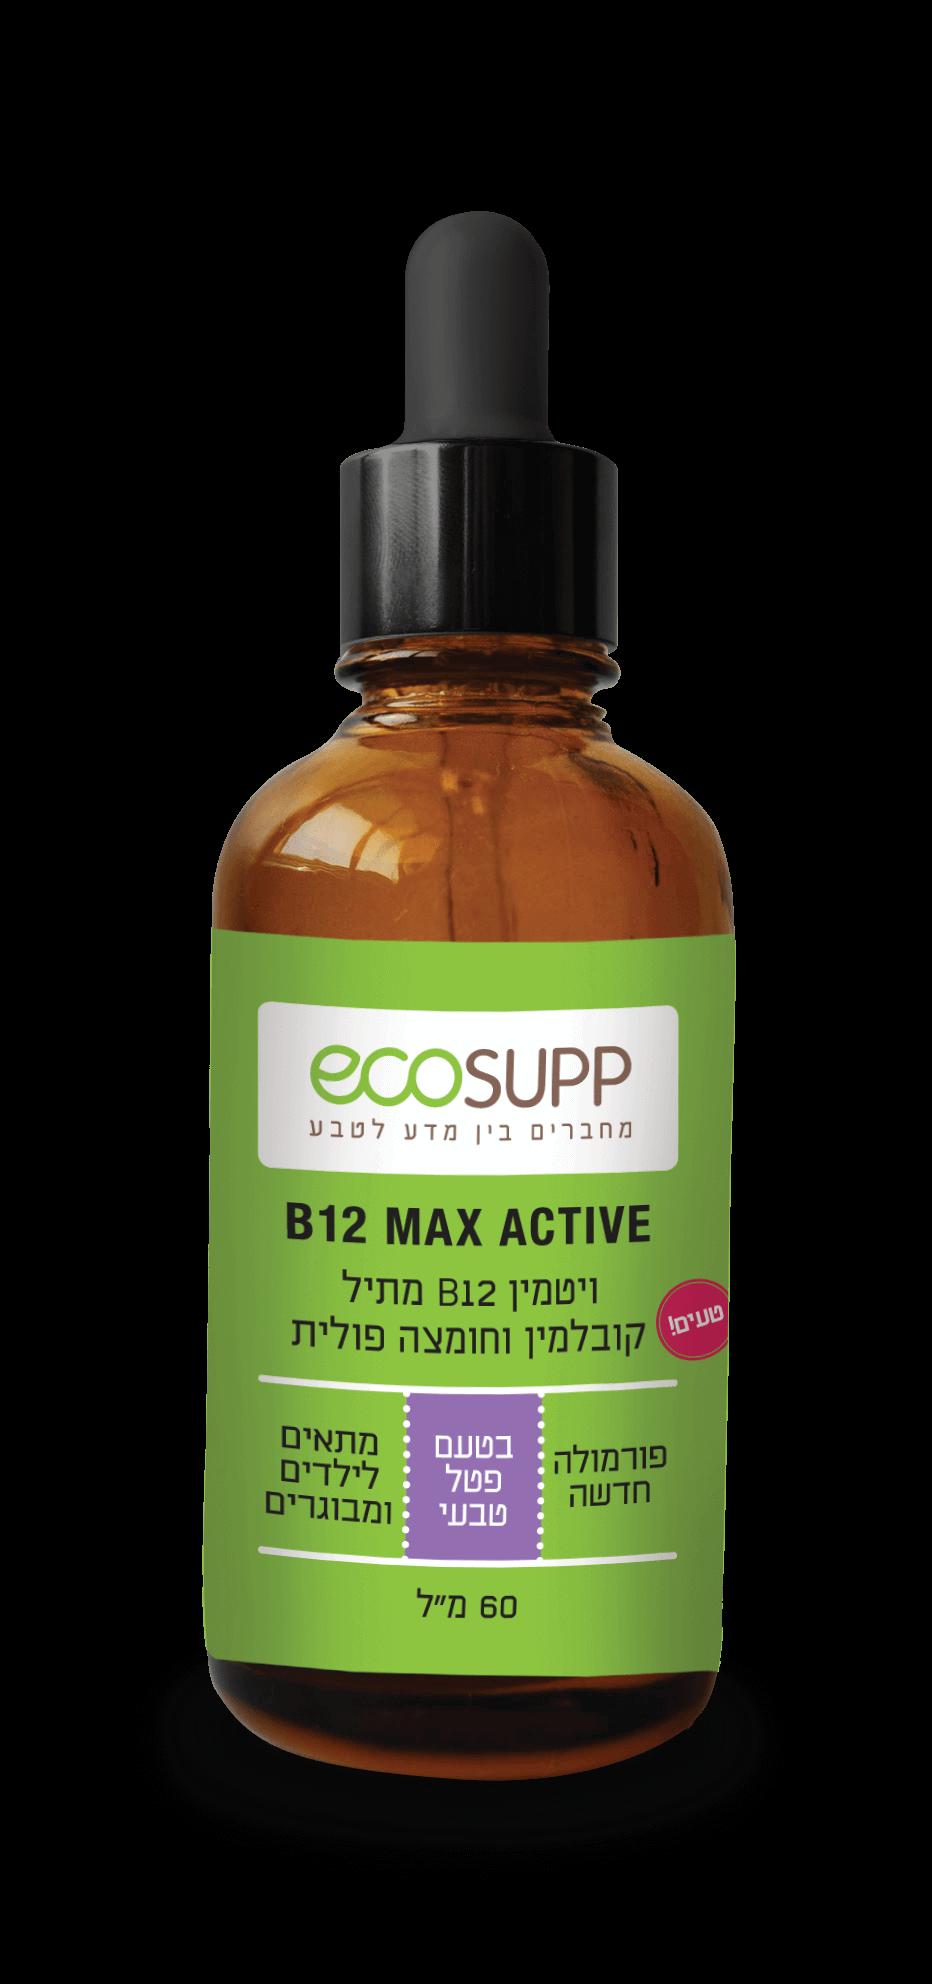 B12 MAX ACTIVE